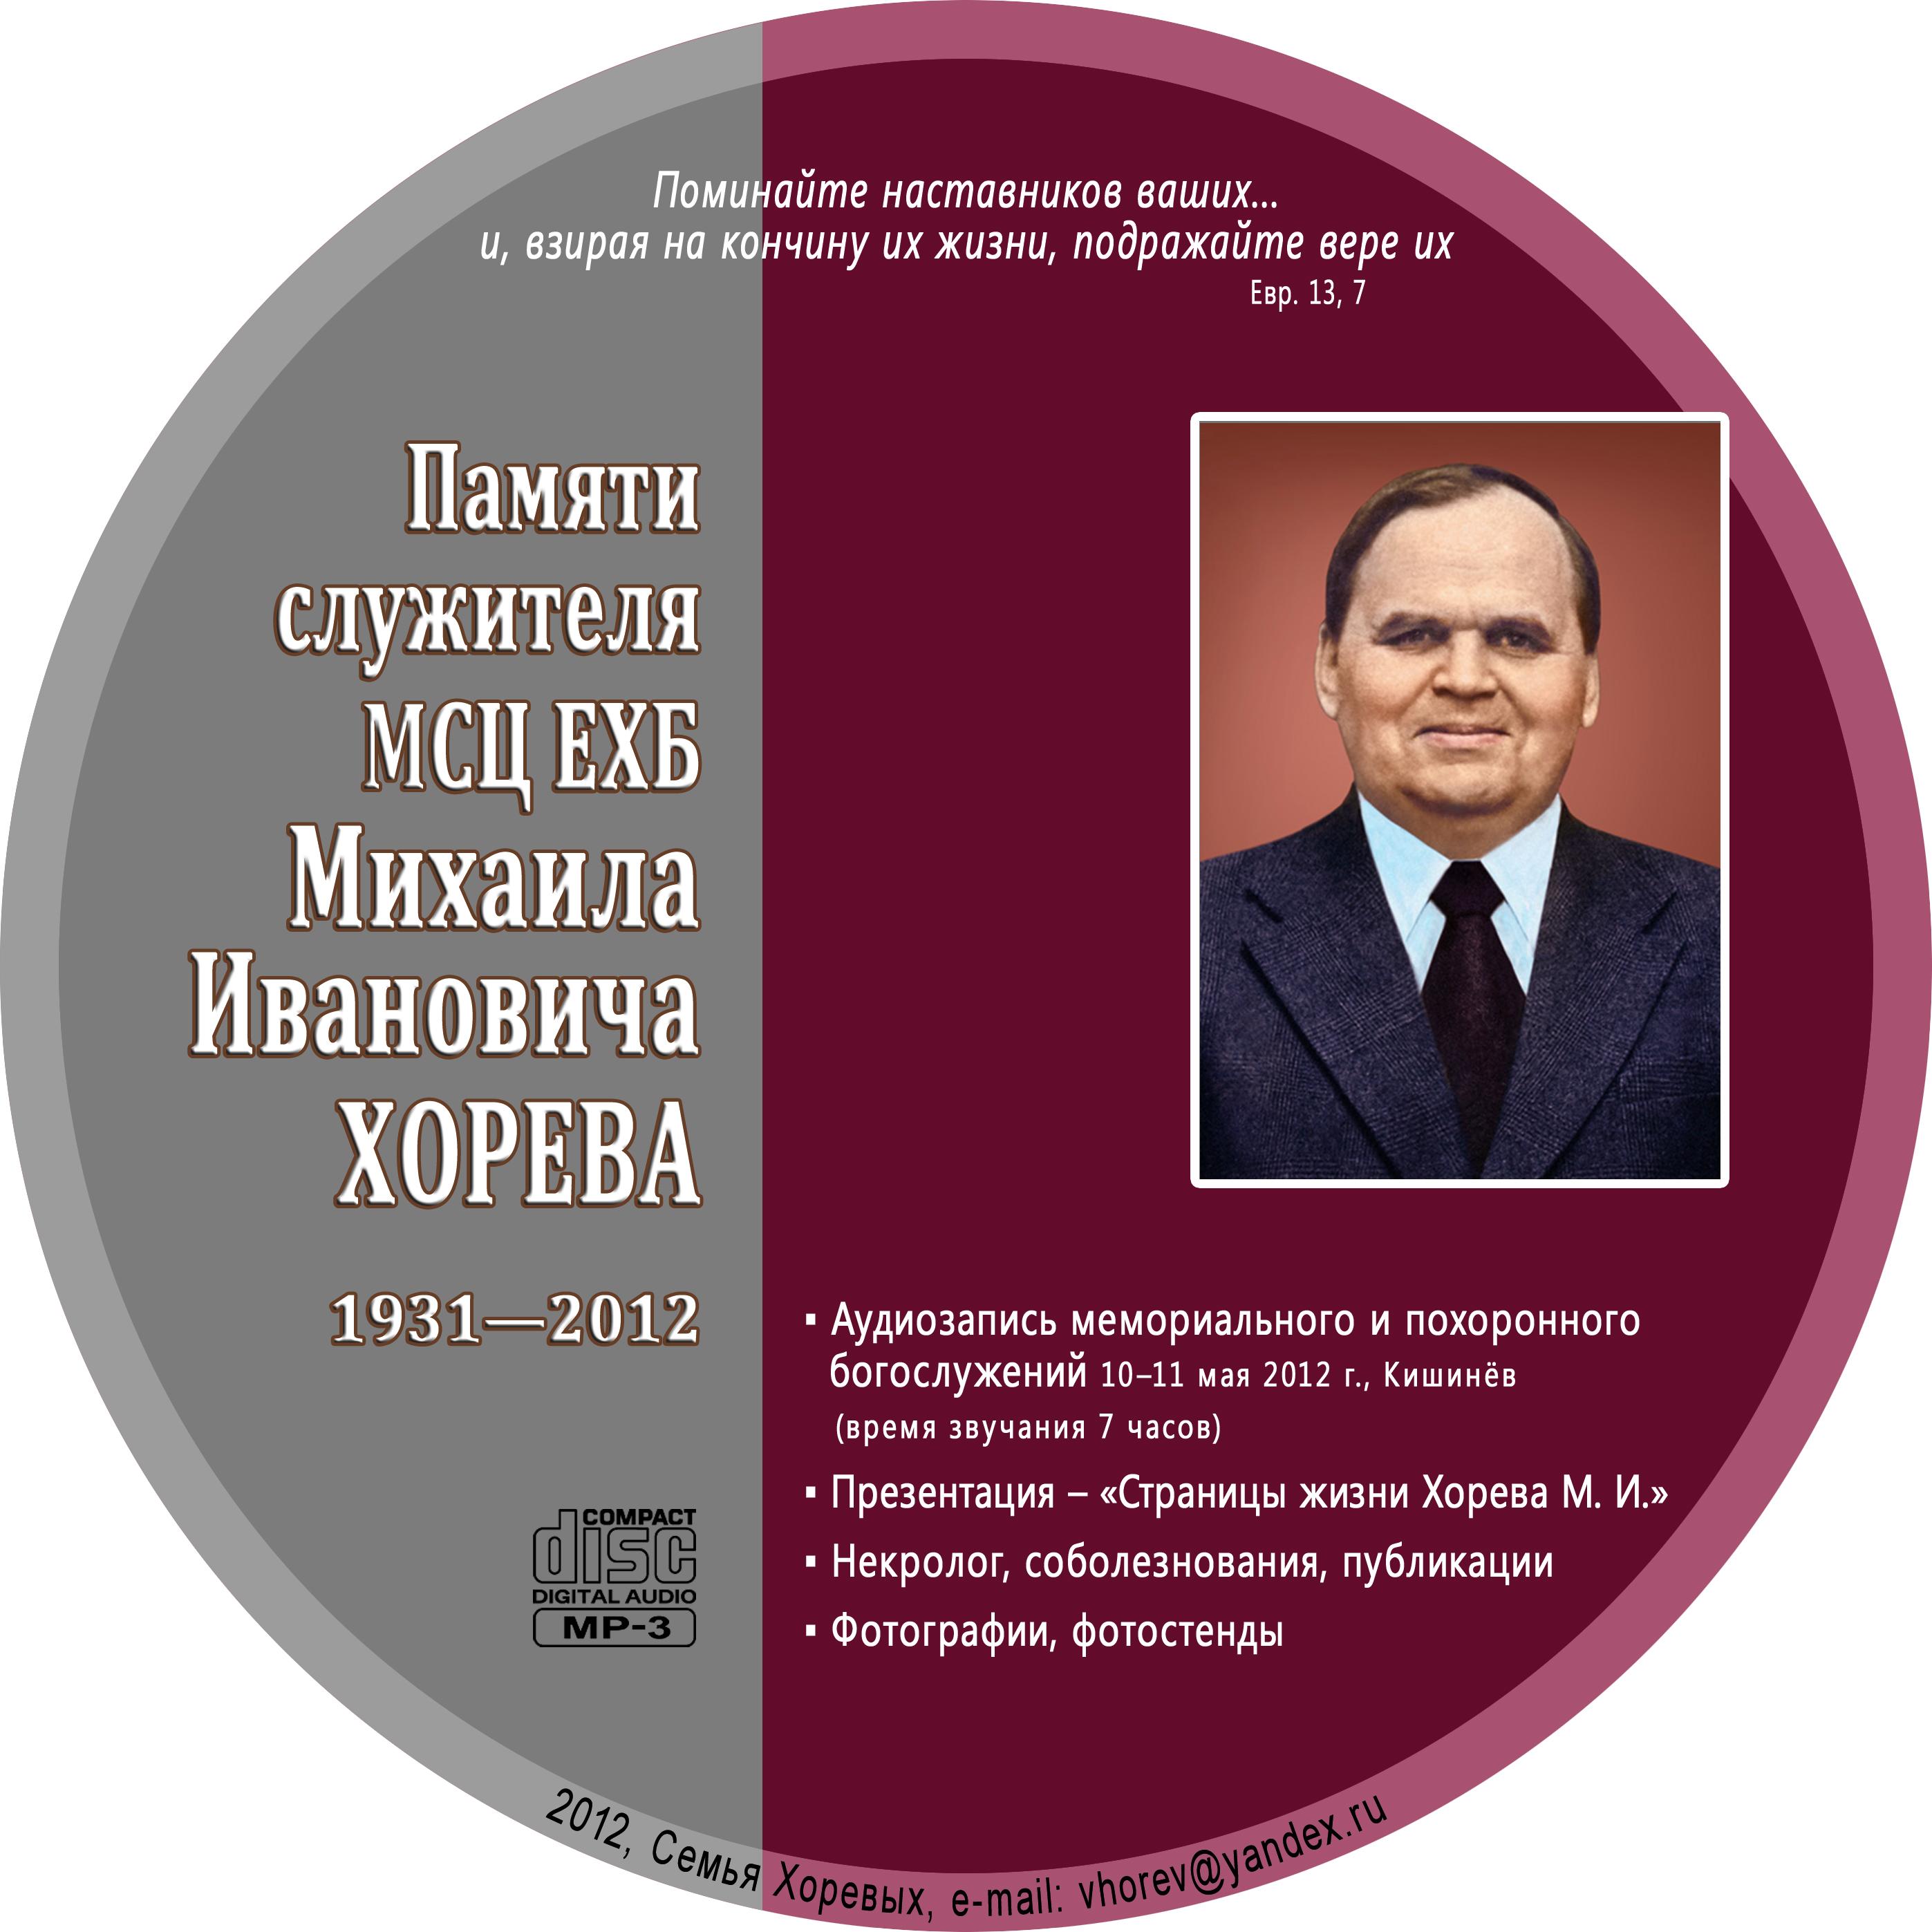 Памяти служителя МСЦ ЕХБ Михаила Ивановича Хорева 2012